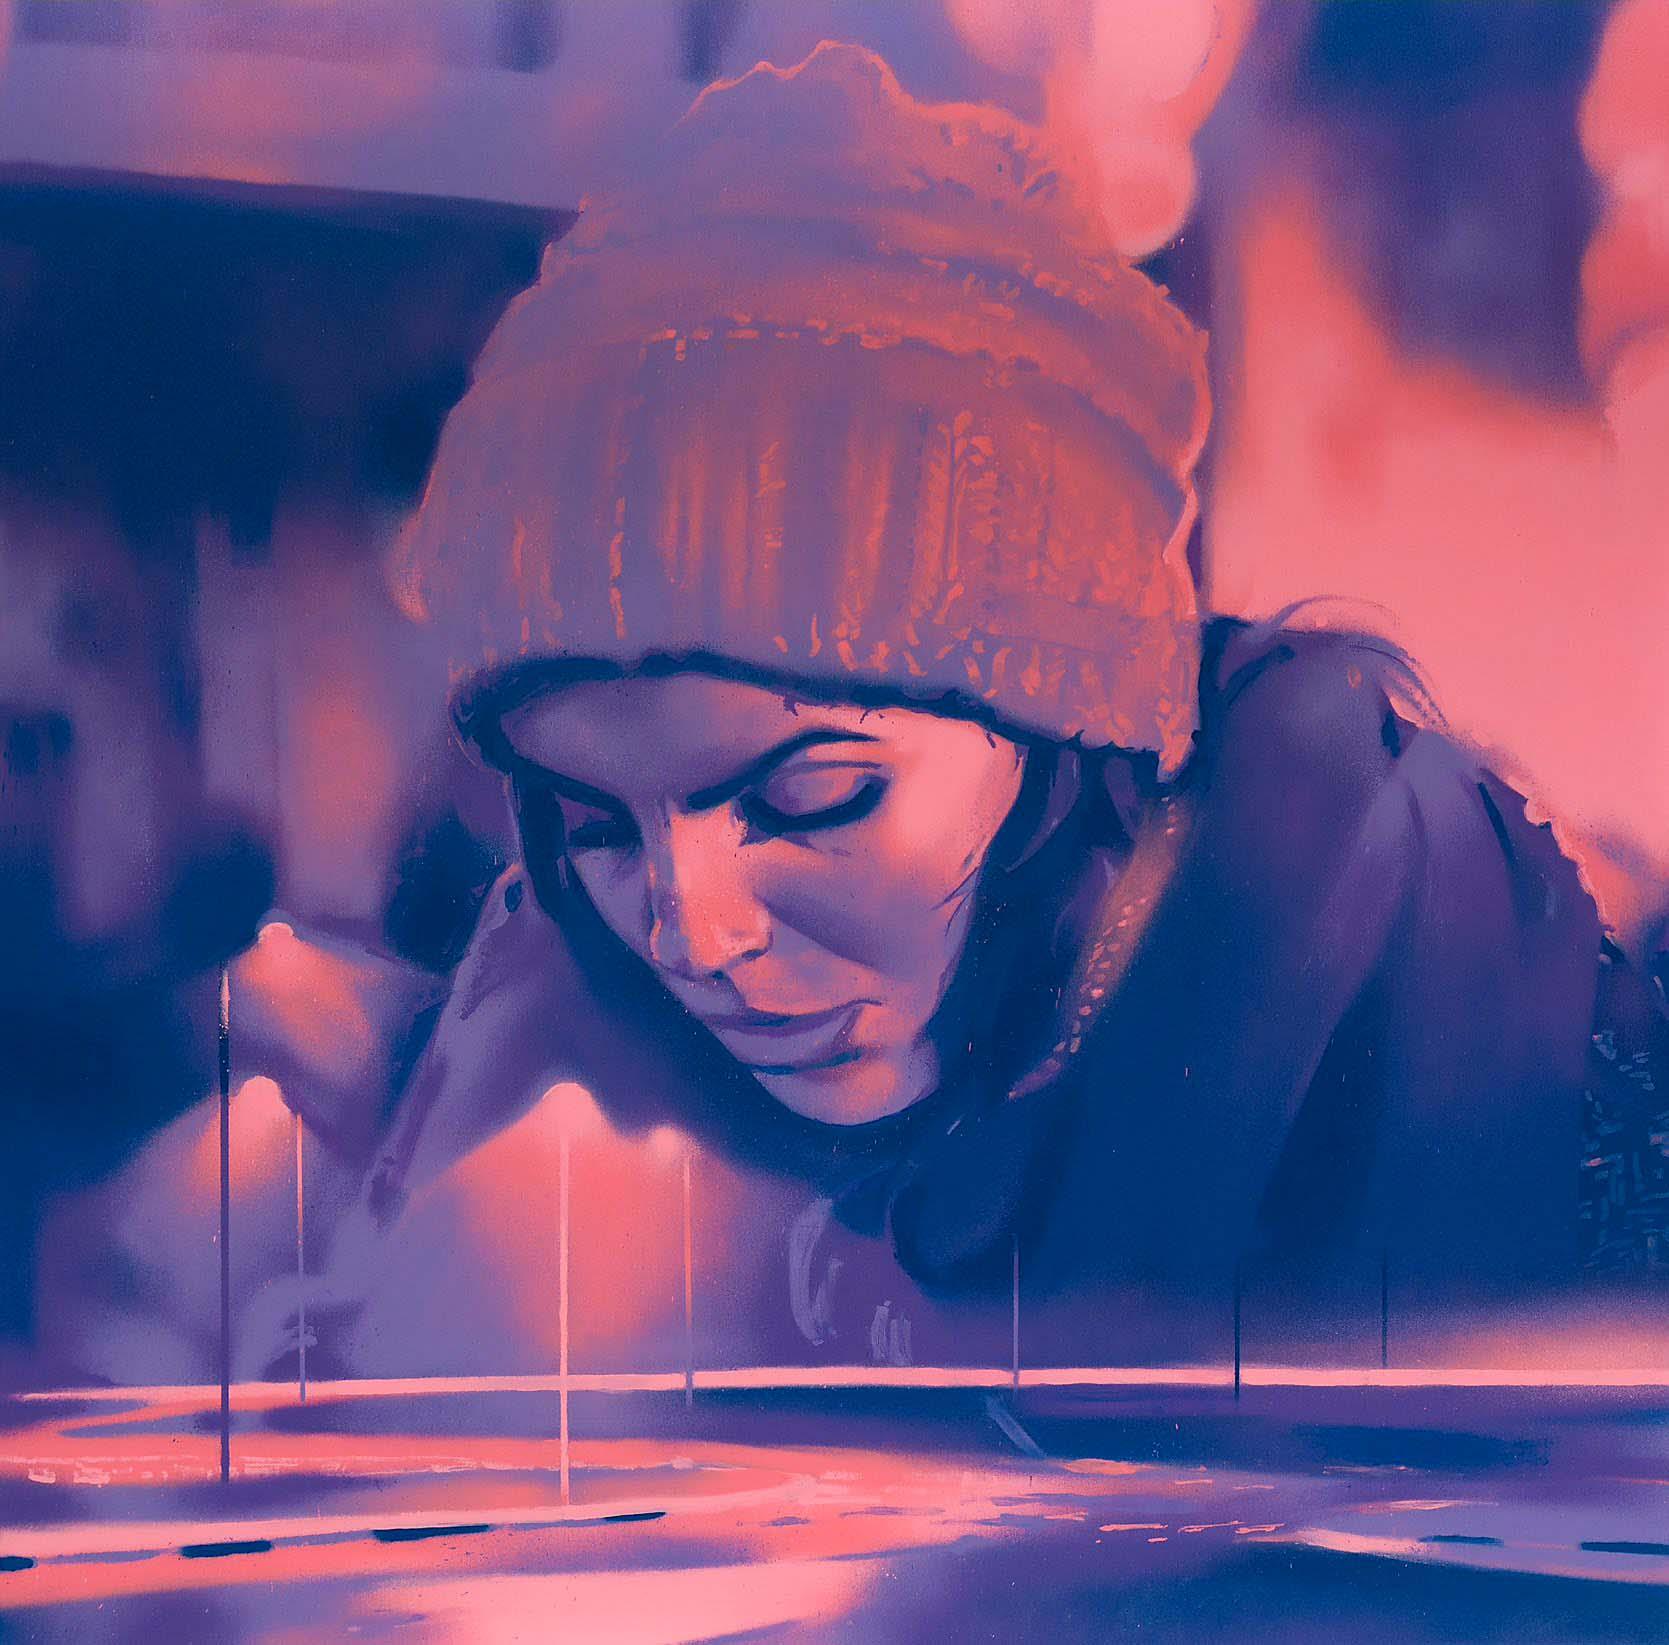 https://www.propaganza.be/wp-content/uploads/2019/04/Nean-tightrope-figuratif-calligraphie-propaganza-urban-artist-graffiti-graff-street-art-spray-painting-belgique-1.jpg